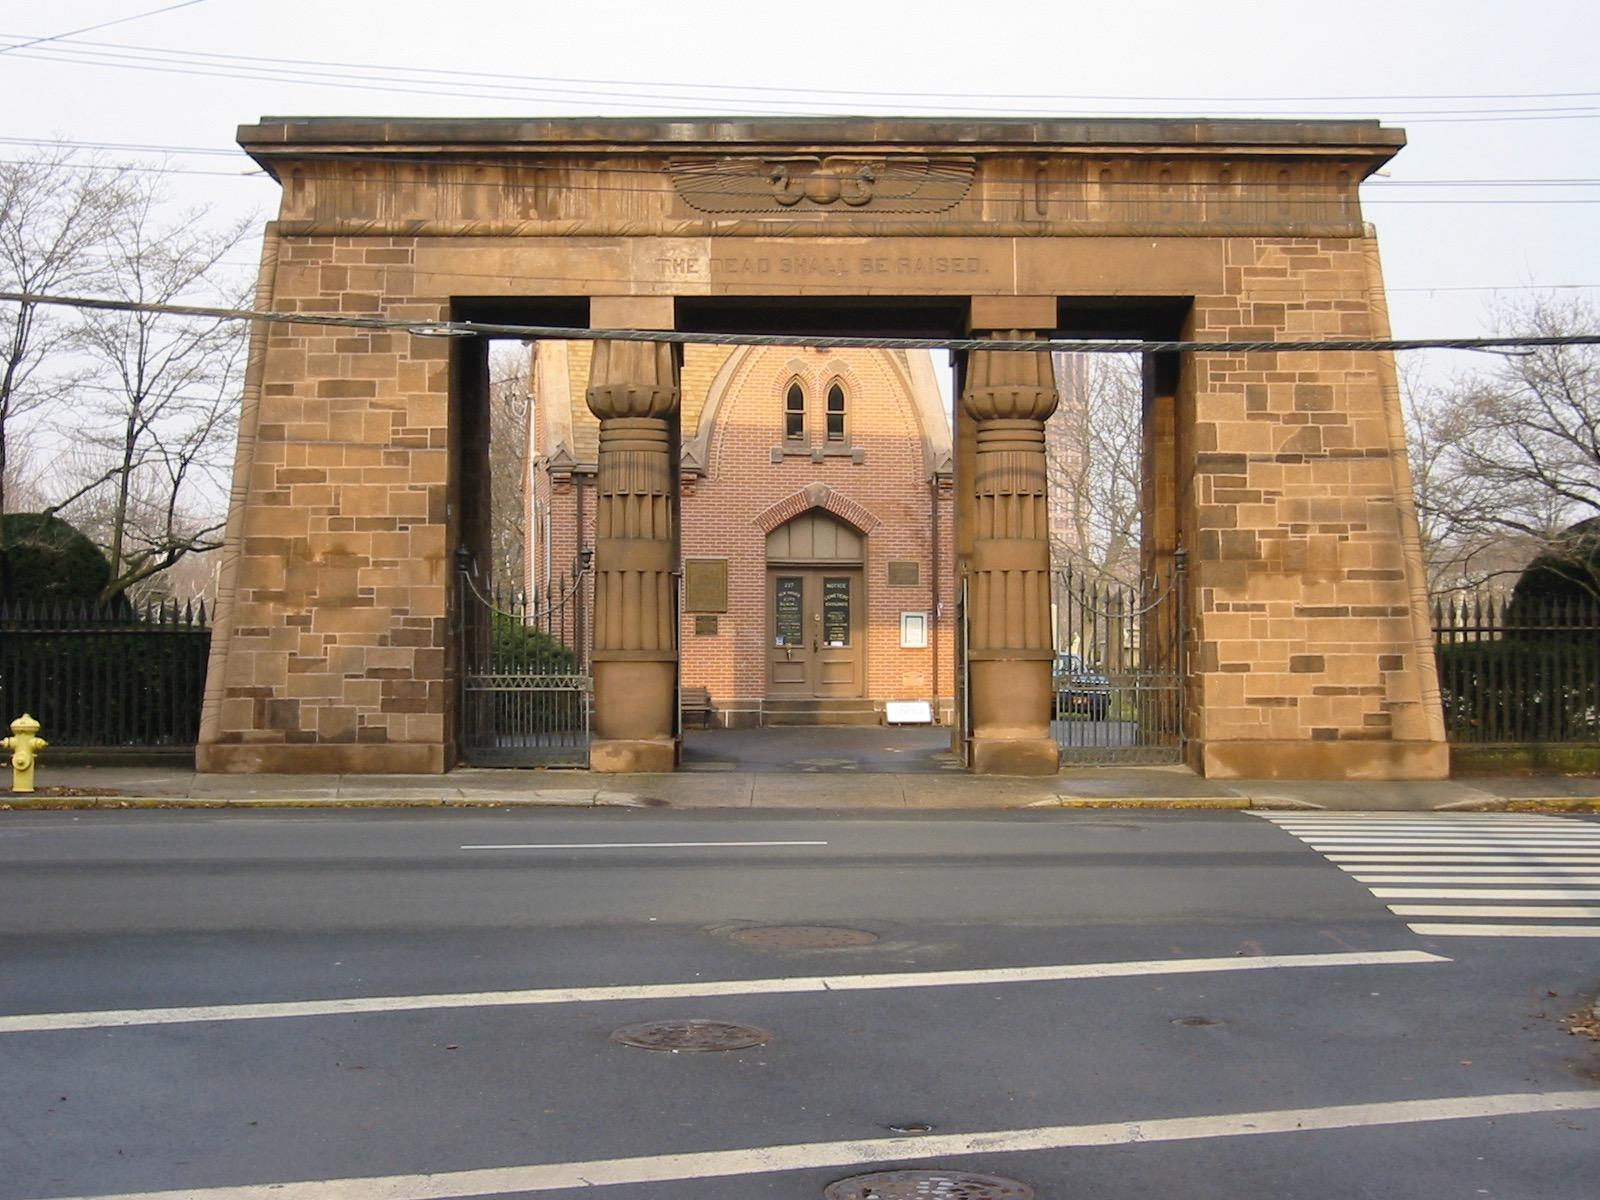 Grove Street Cemetery gate, New Haven, Meacham photo